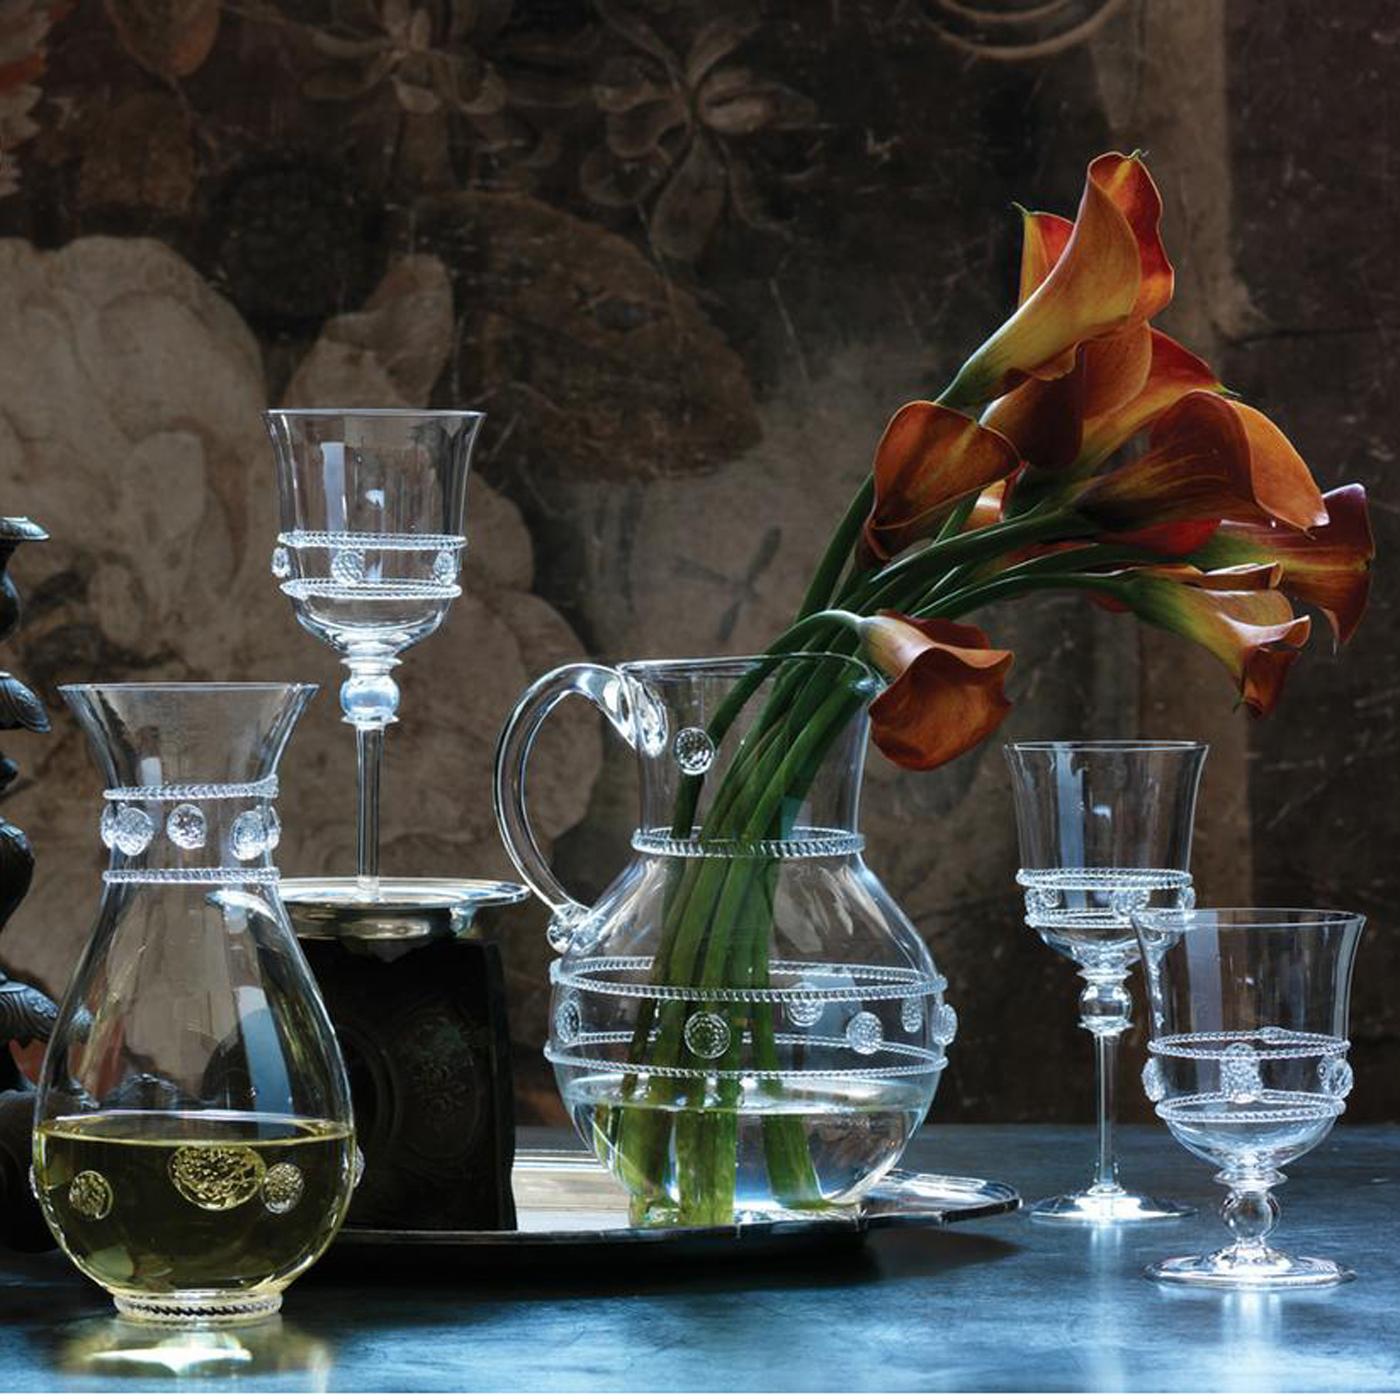 bohemian-glassbut2.jpg